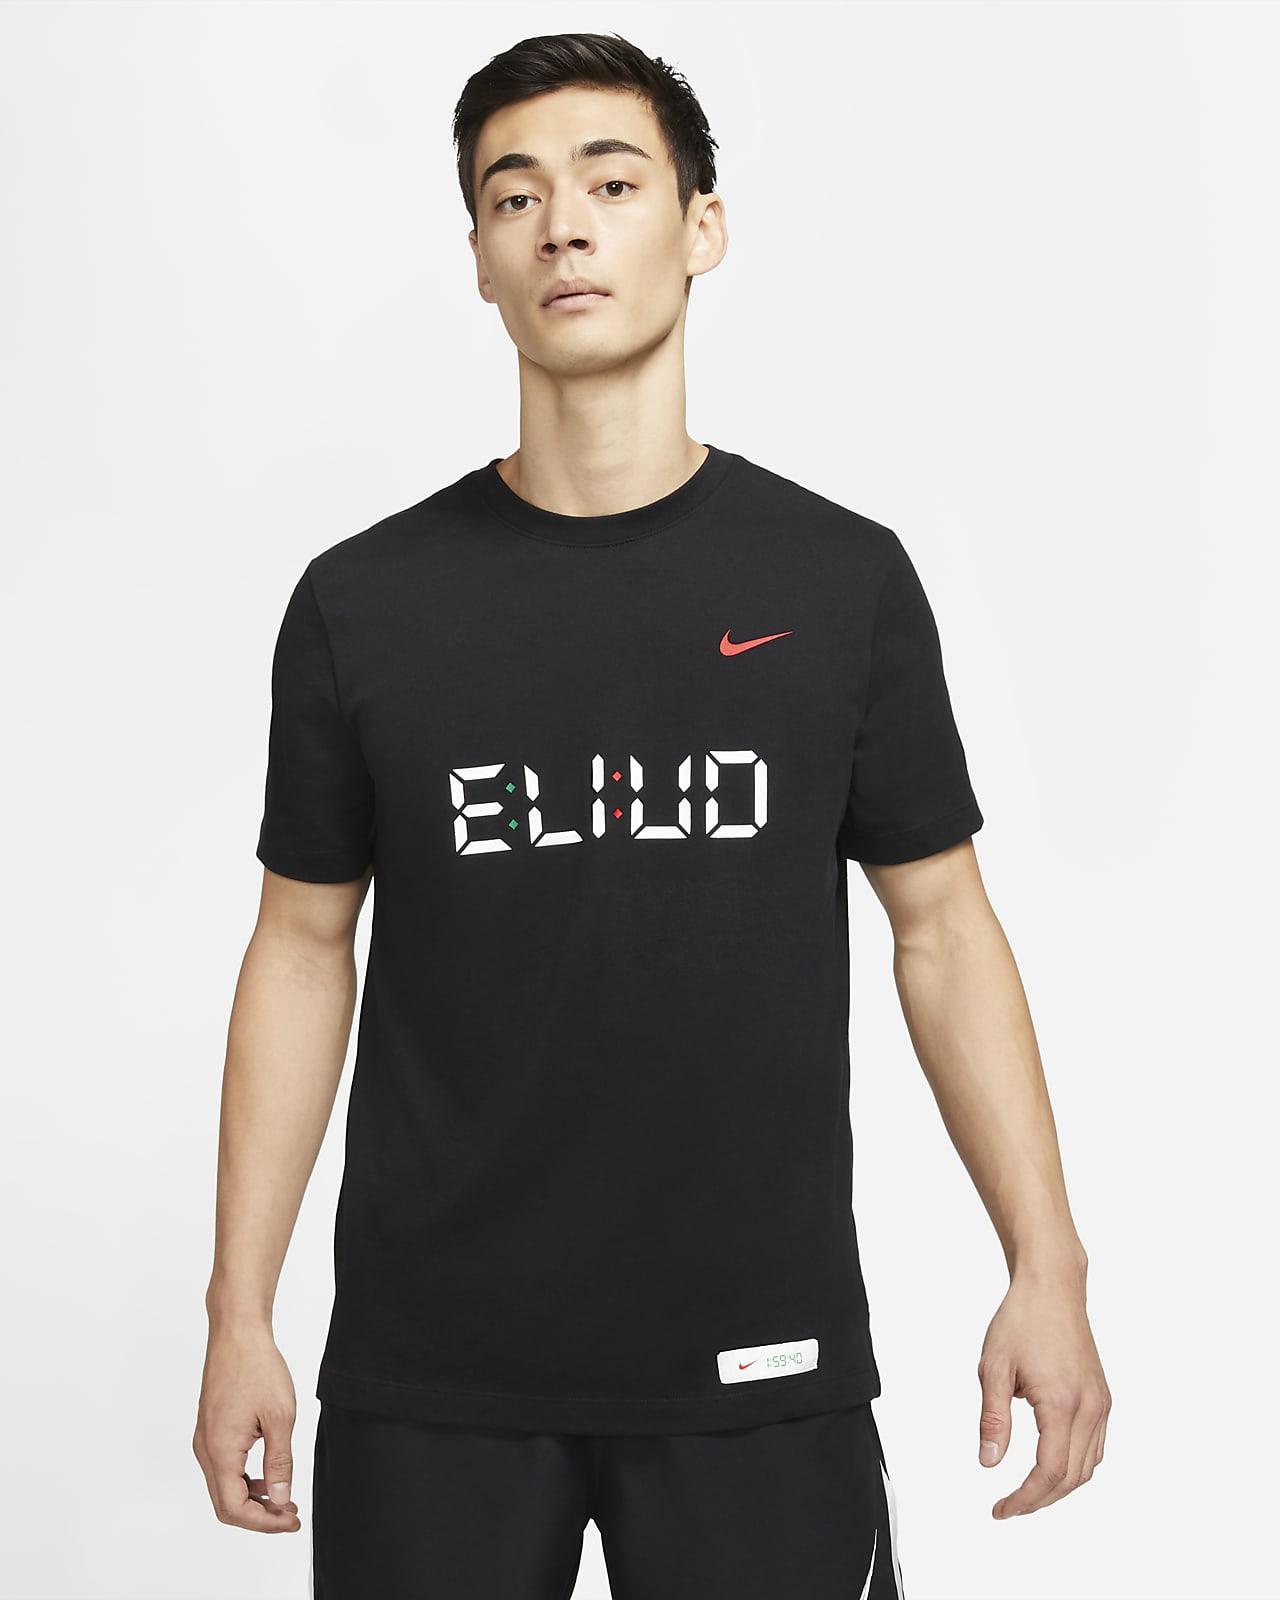 Nike Dri-FIT Eliud 跑步 T 恤